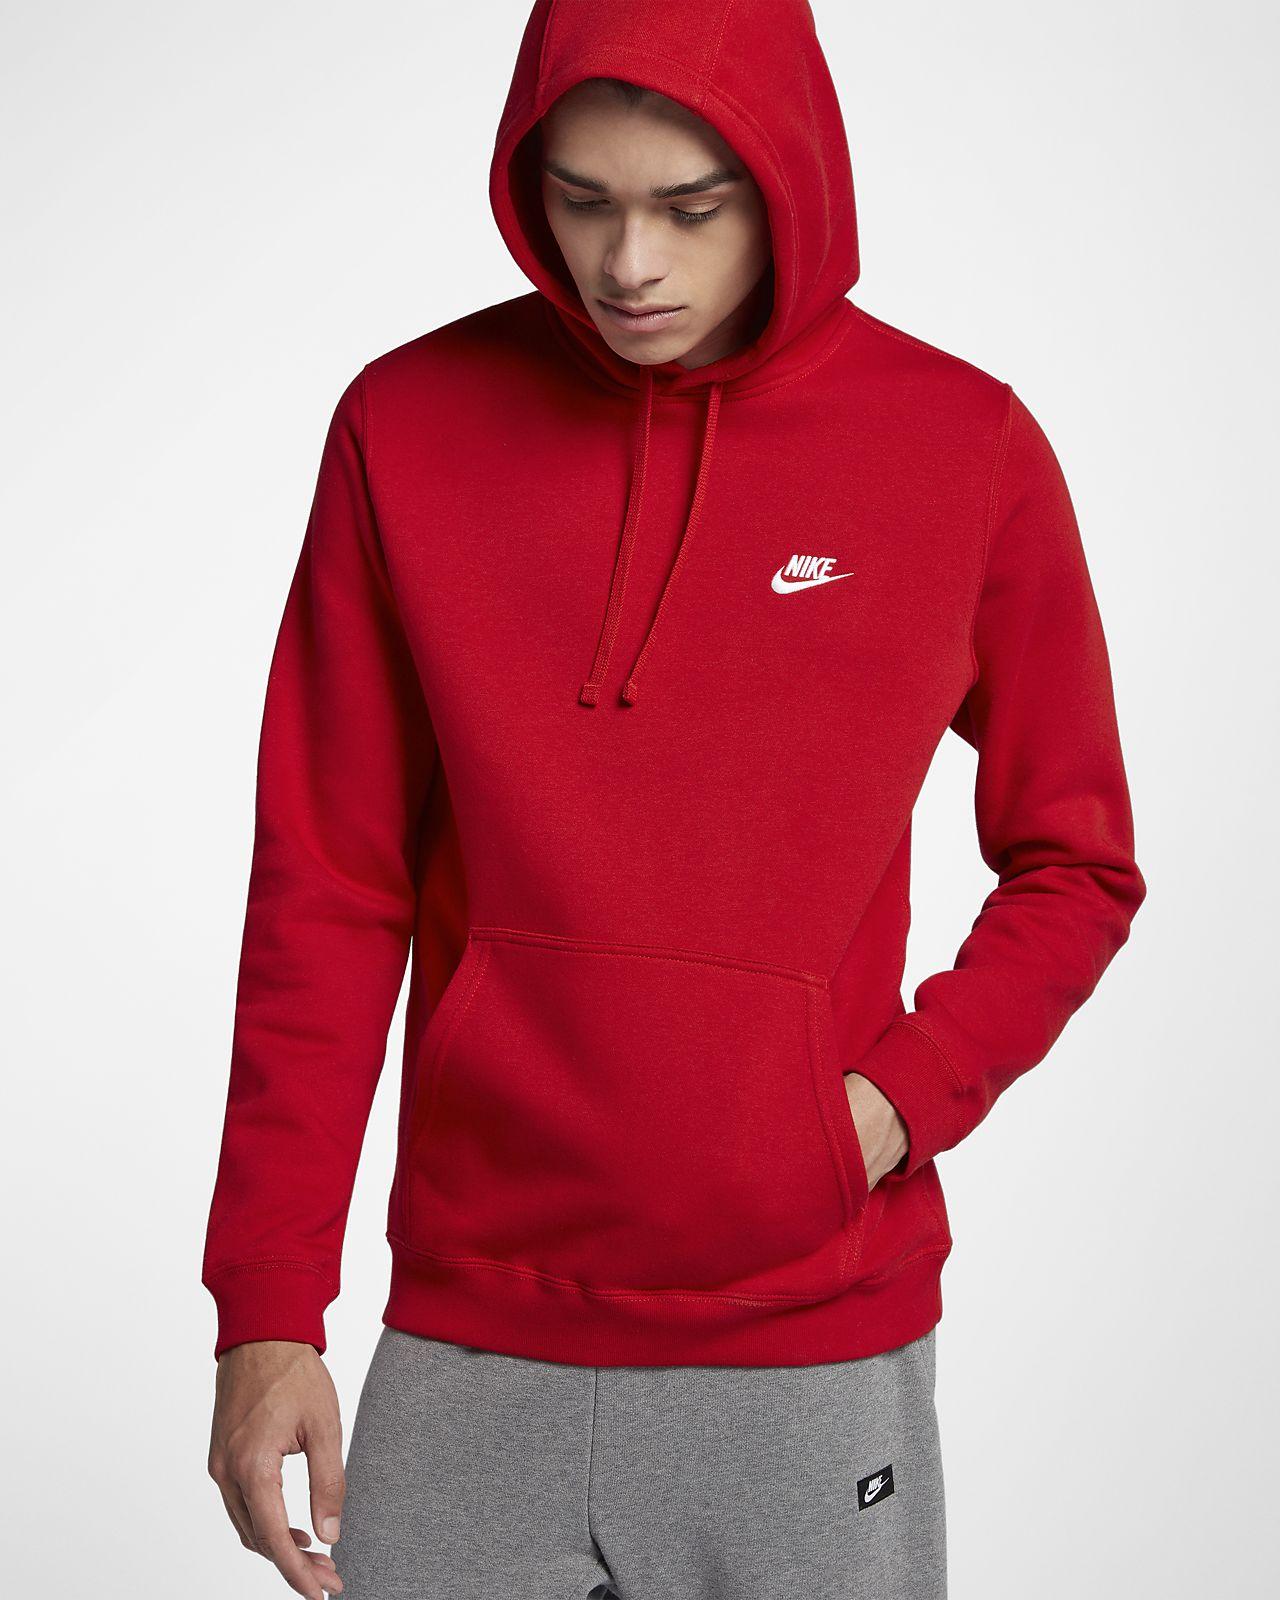 fcd2593dc Nike Sportswear Pullover Hoodie. Nike.com MA